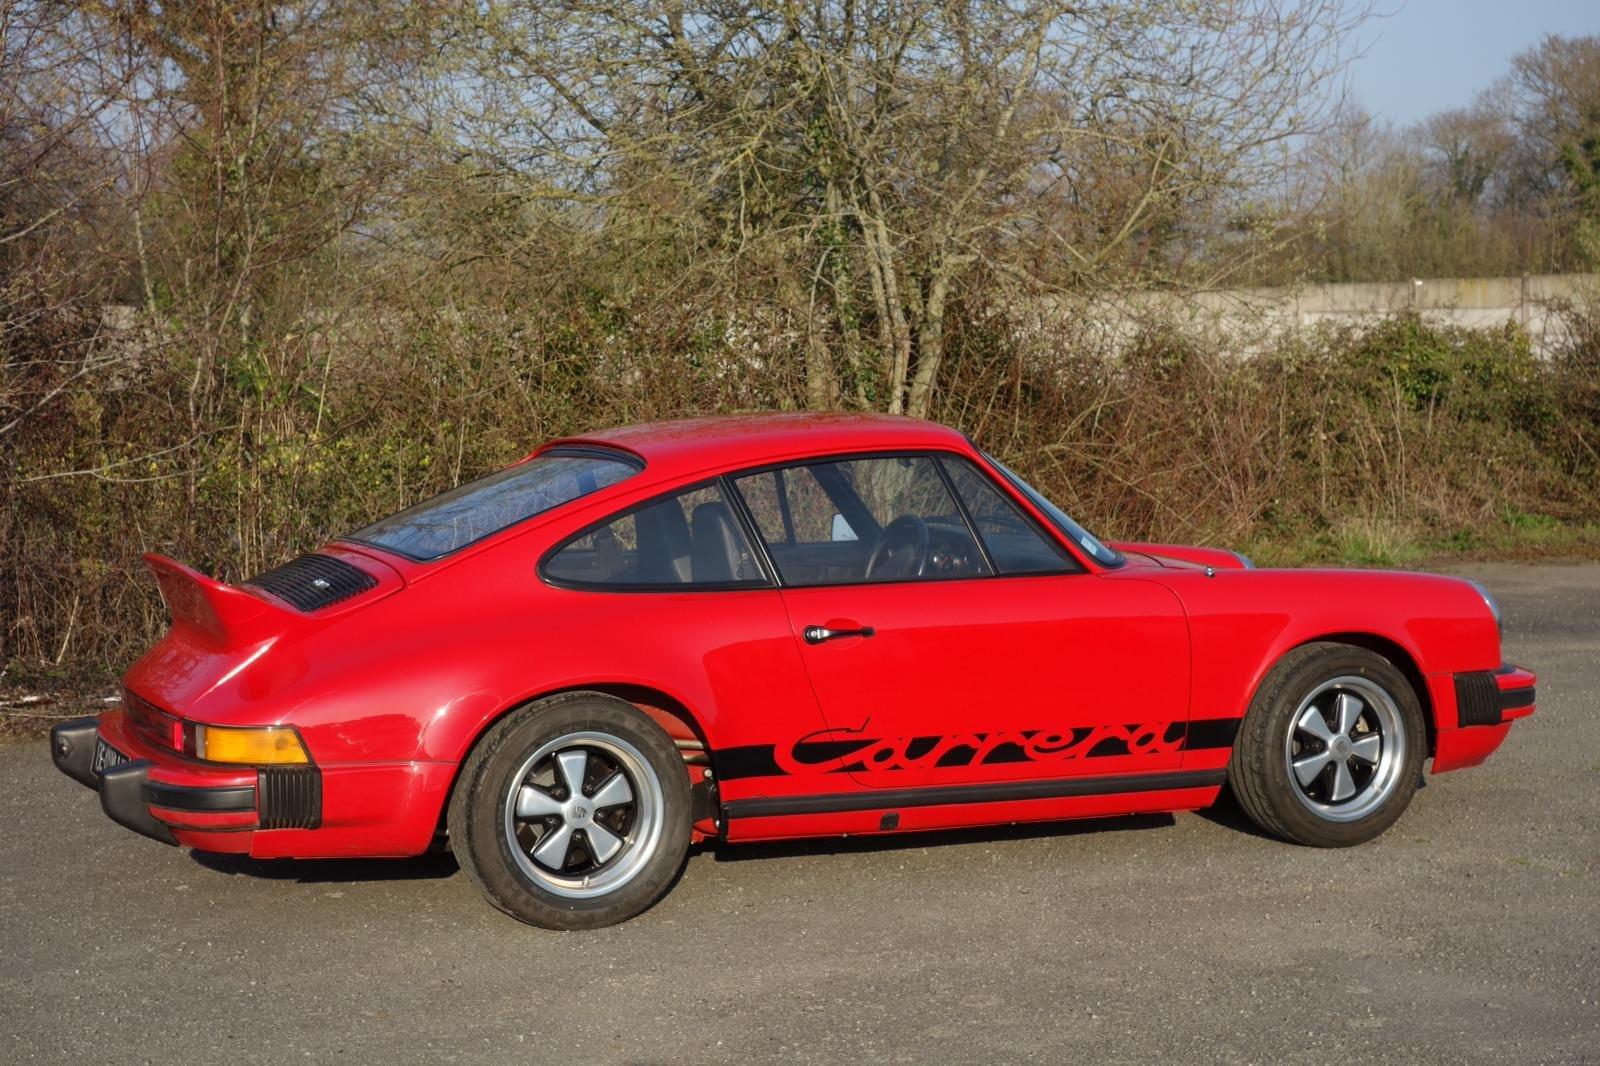 1975 Beautiful 911 carrera 2.7l MFI For Sale (picture 5 of 5)